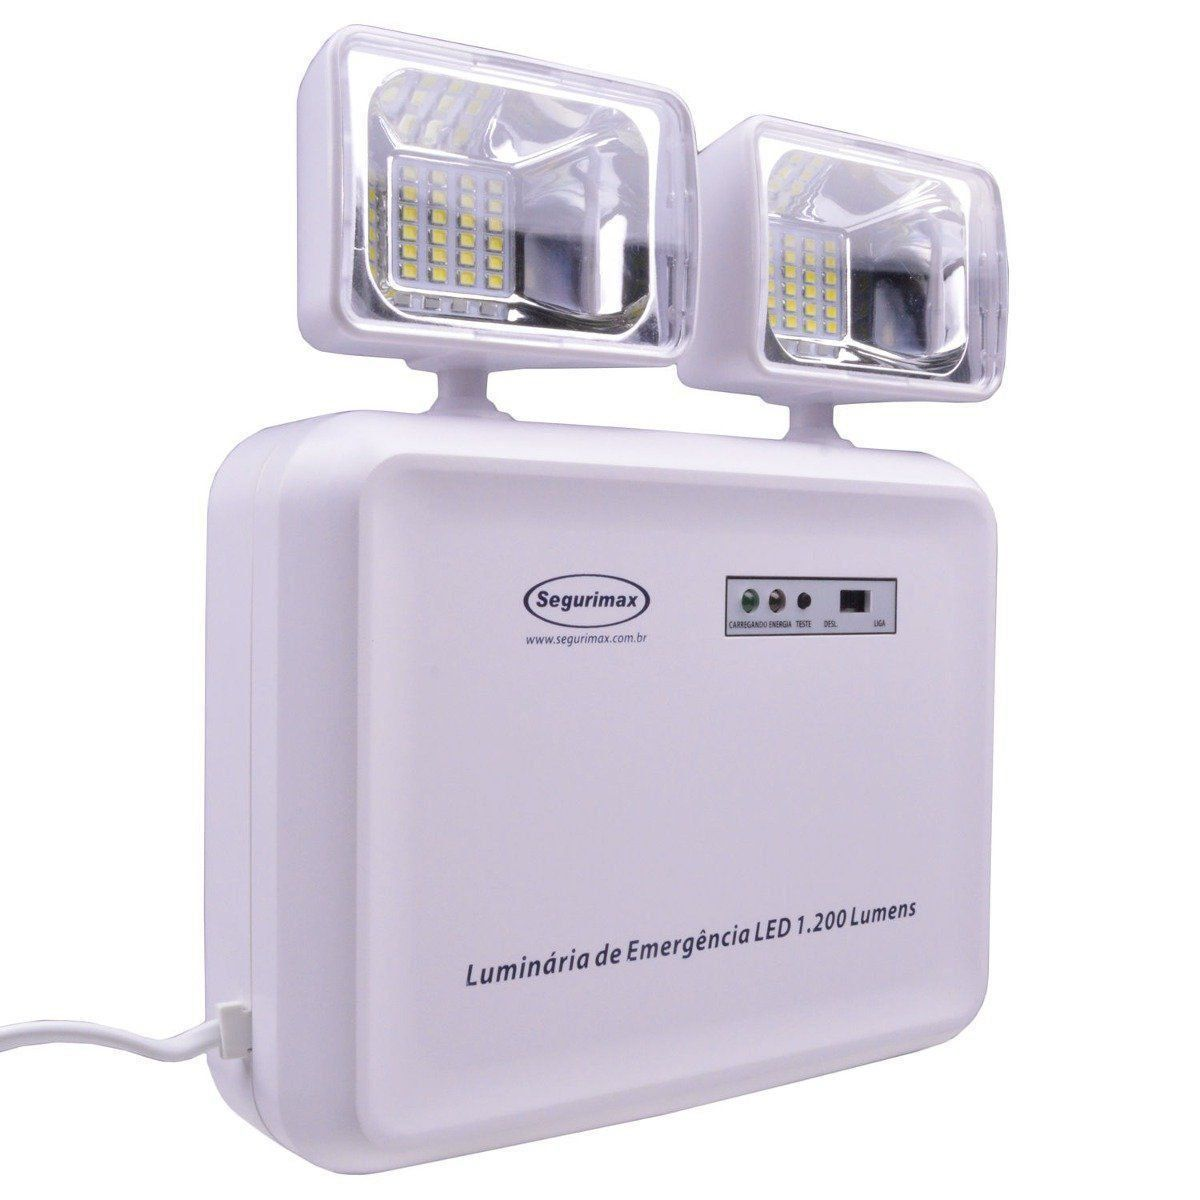 Luminária De Emergência Led 1200 Luméns Segurimax Bivolt